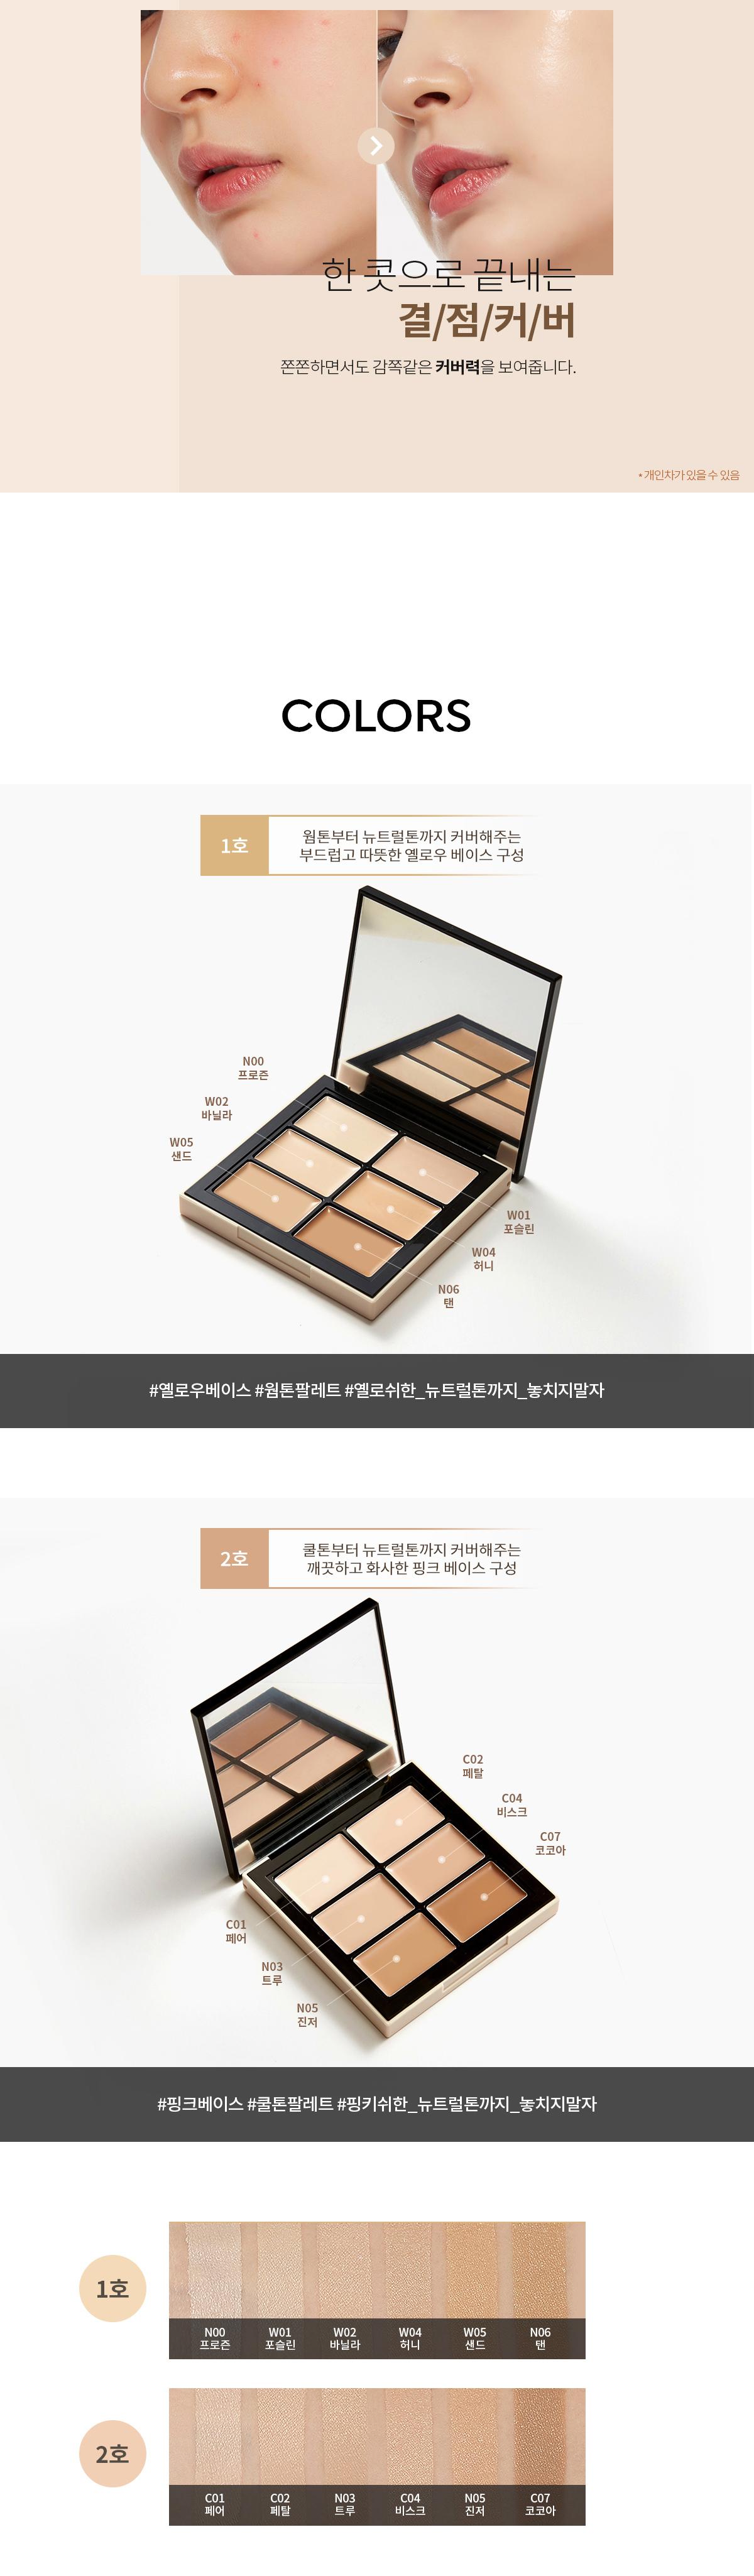 APIEU-Personal-Tone-Concealer-Palette_04.jpg